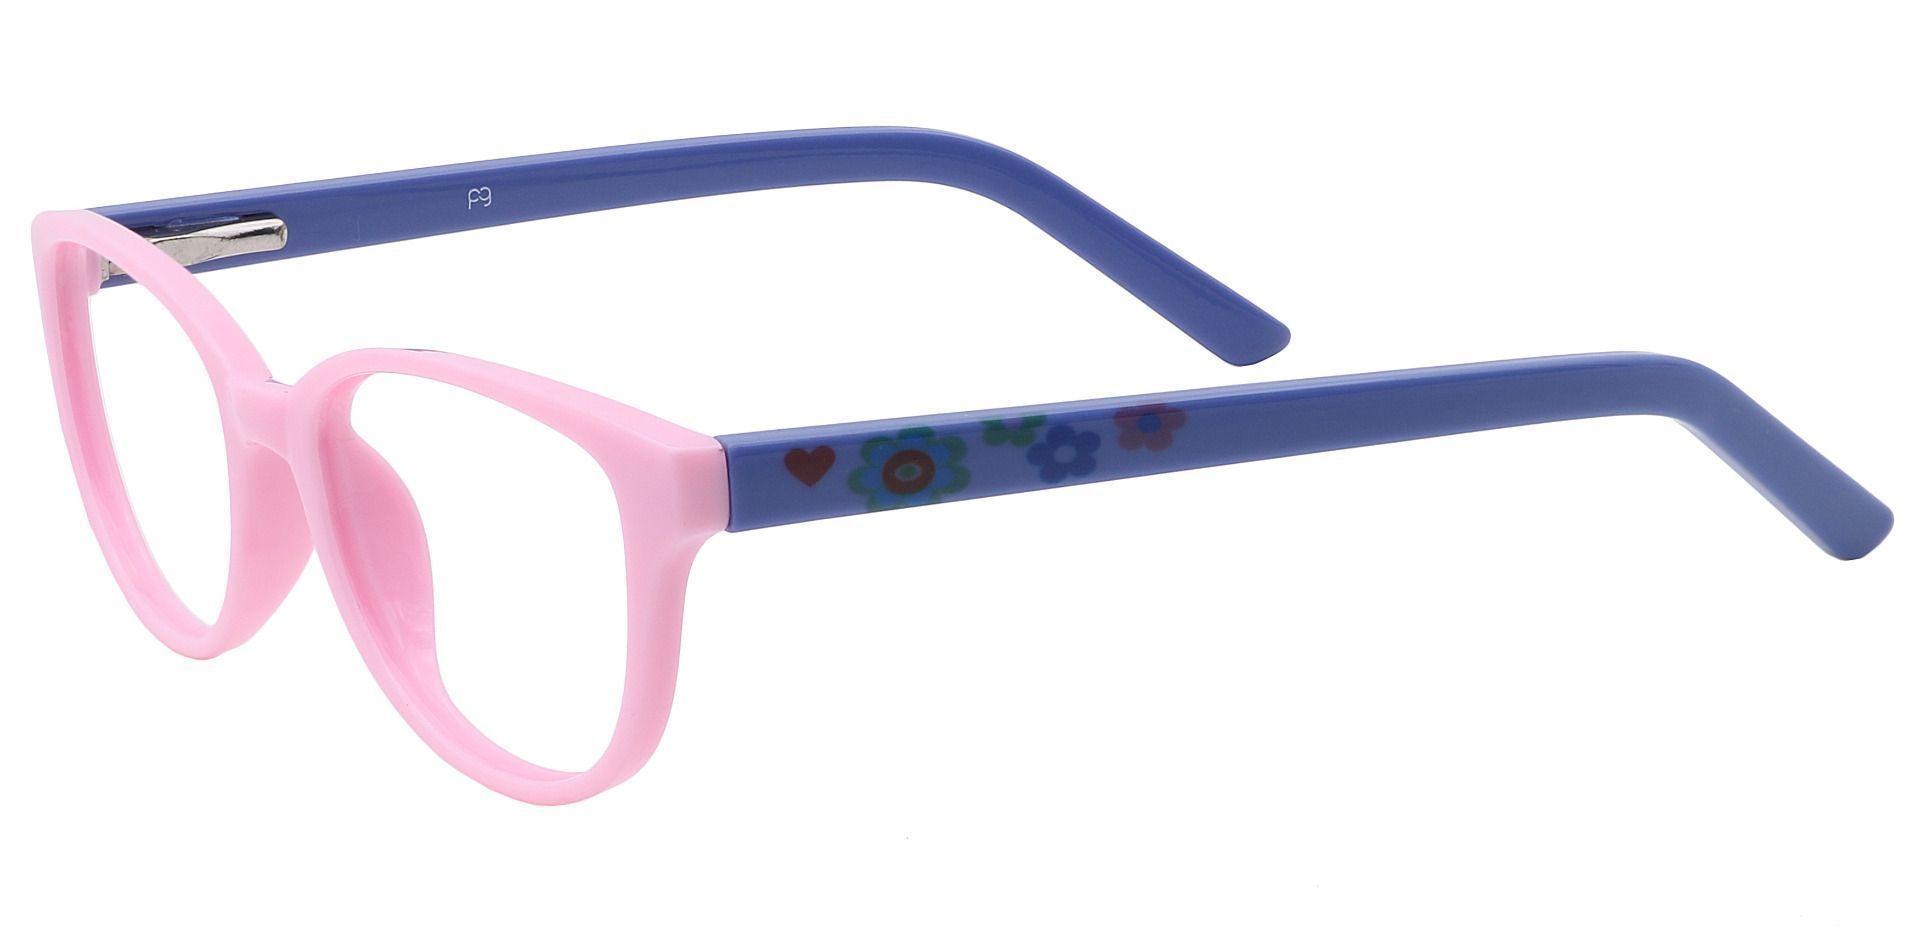 Lulu Oval Prescription Glasses - Pink